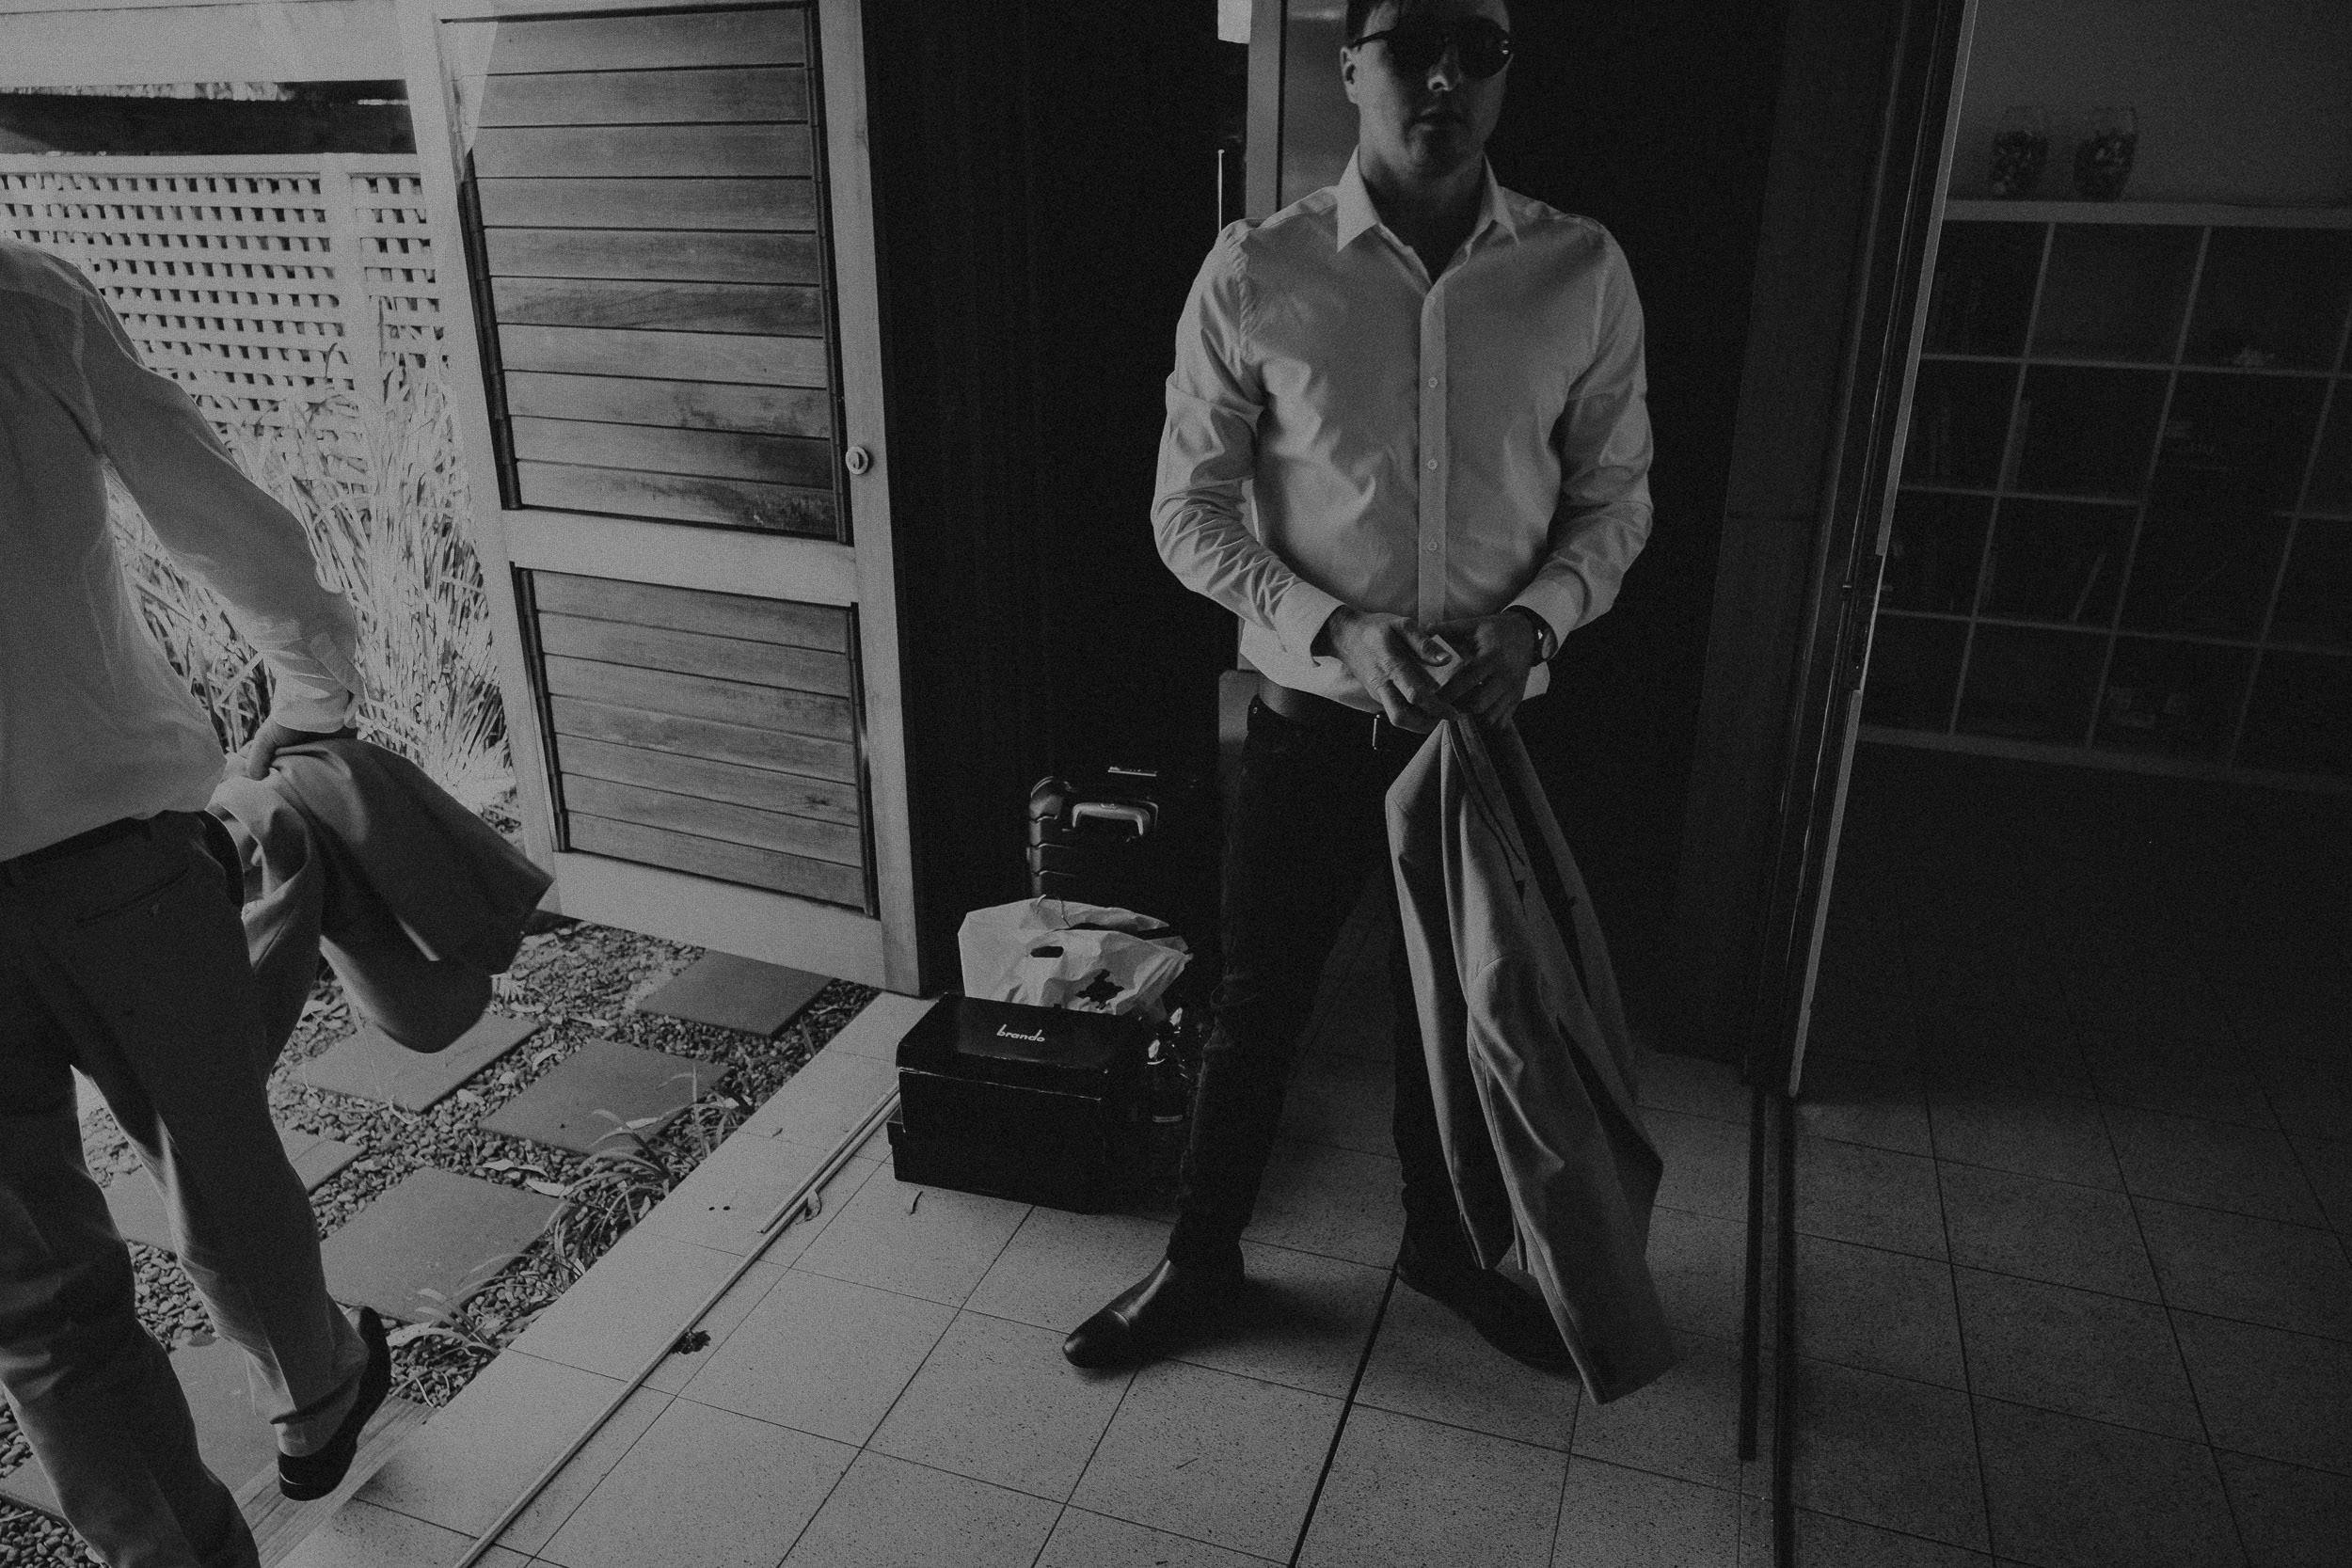 S&A Elopement - Kings & Thieves - Shred 'Til Dead - Central Coast Beach Forest Wedding - 31.jpg